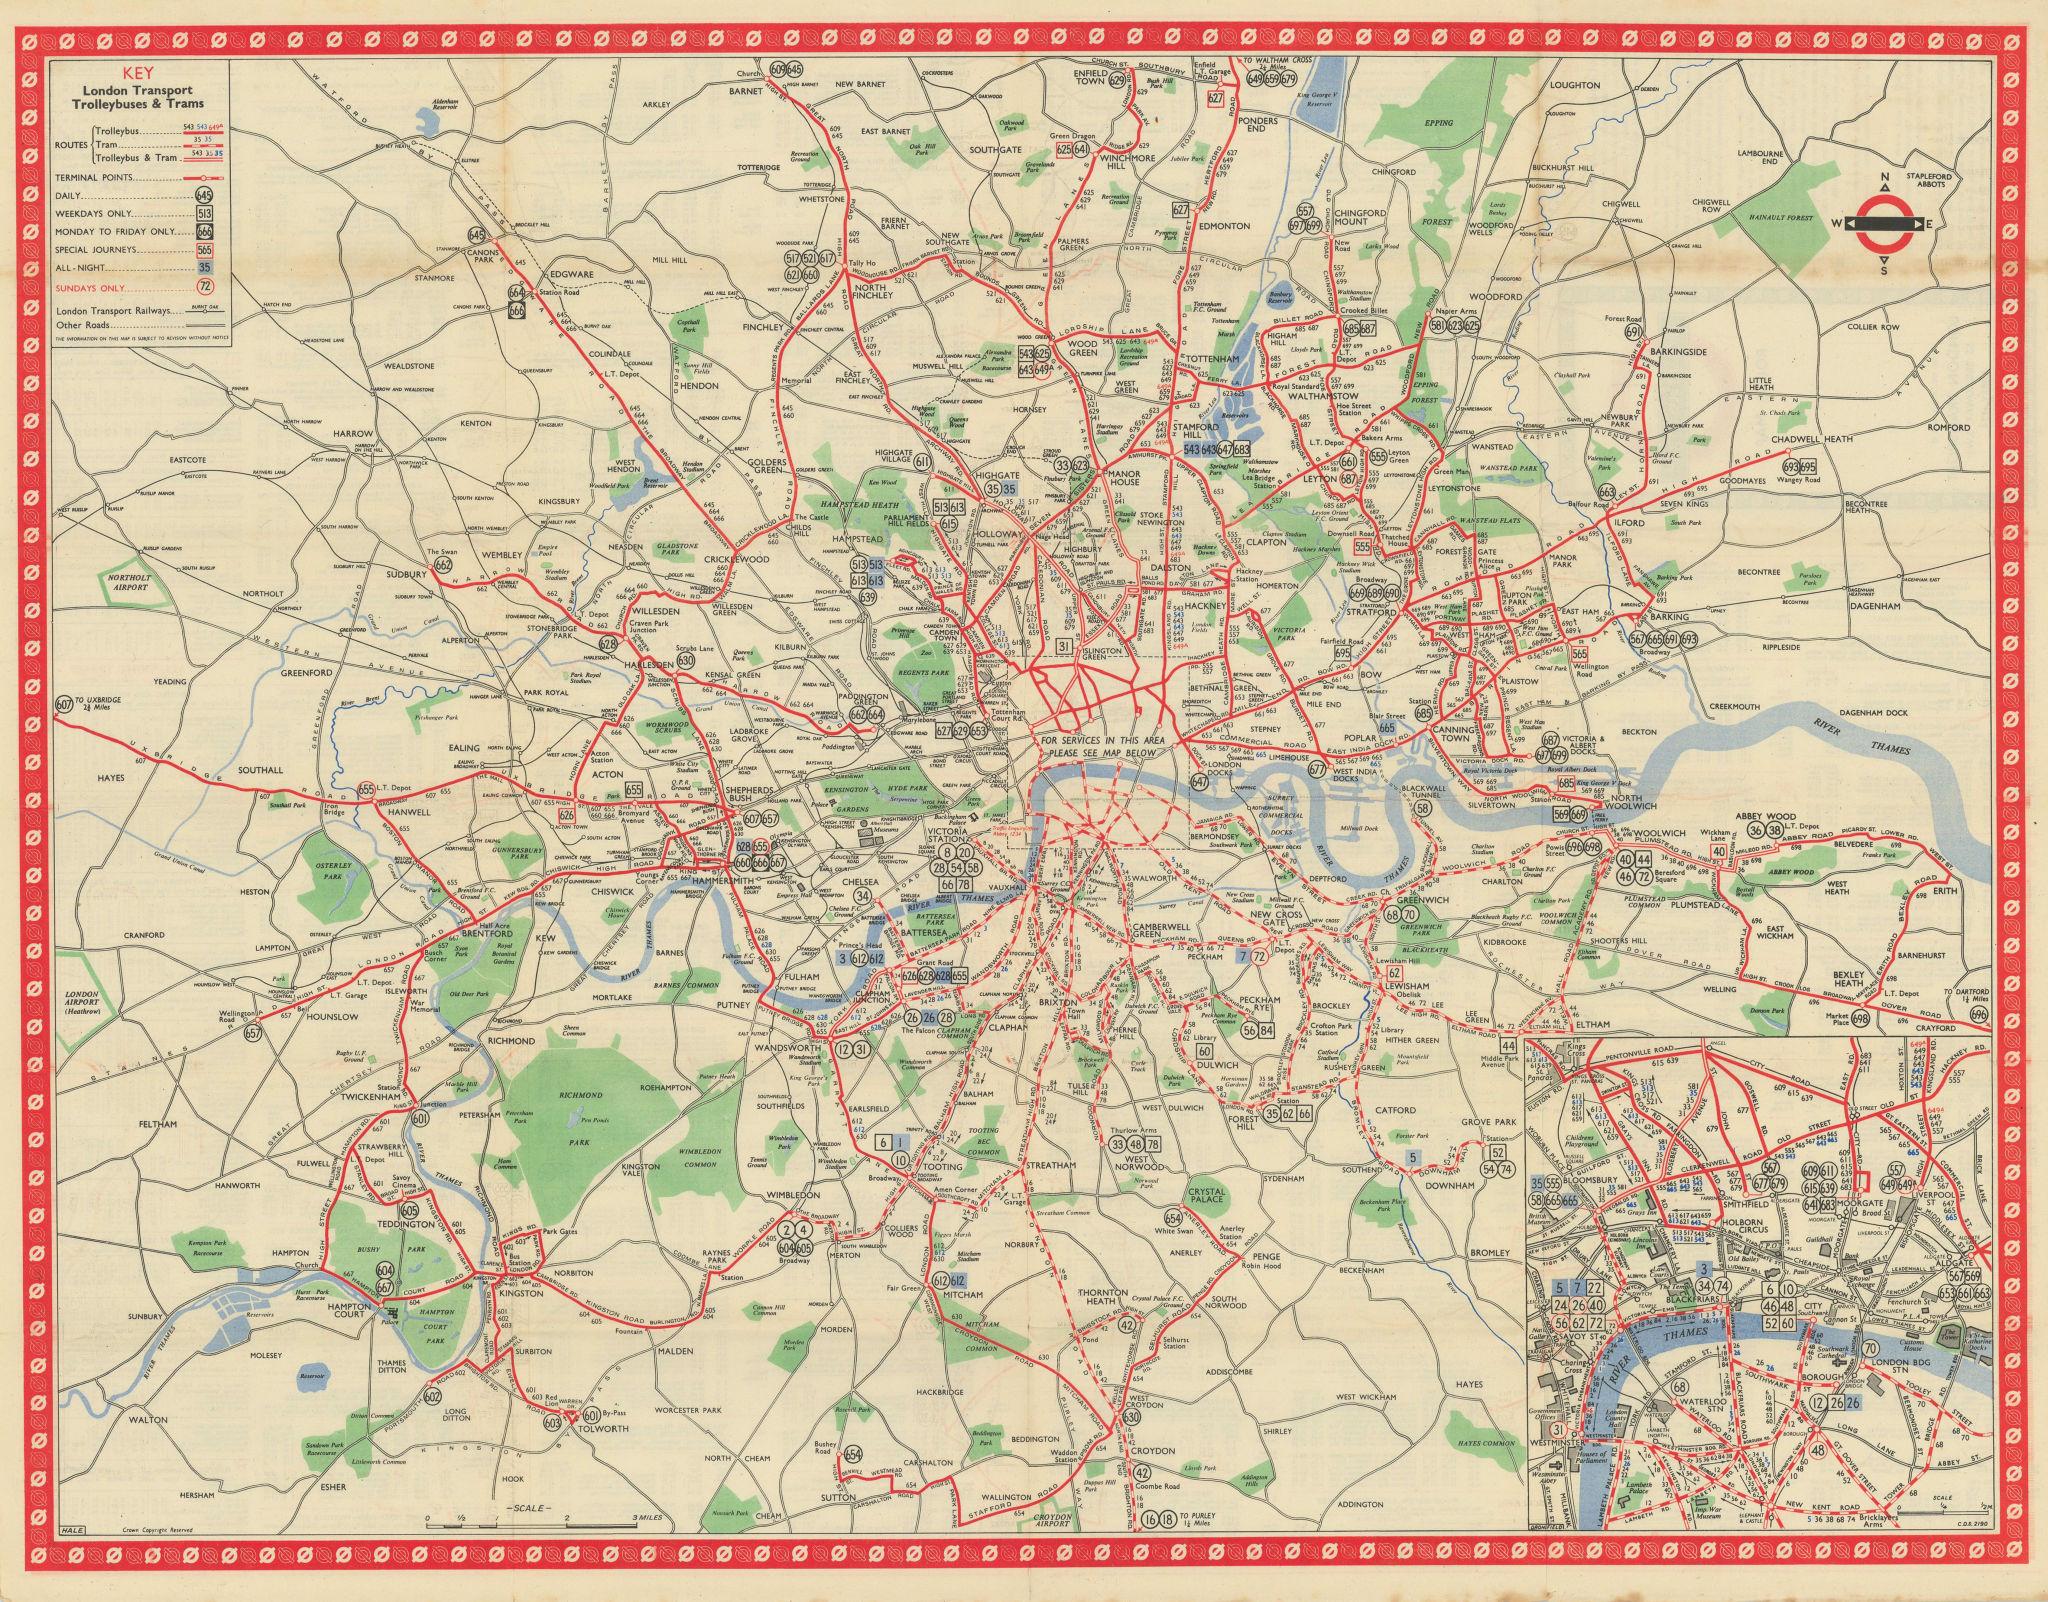 London Transport Trolleybus & Tram route map. 650. HALE January 1950 old